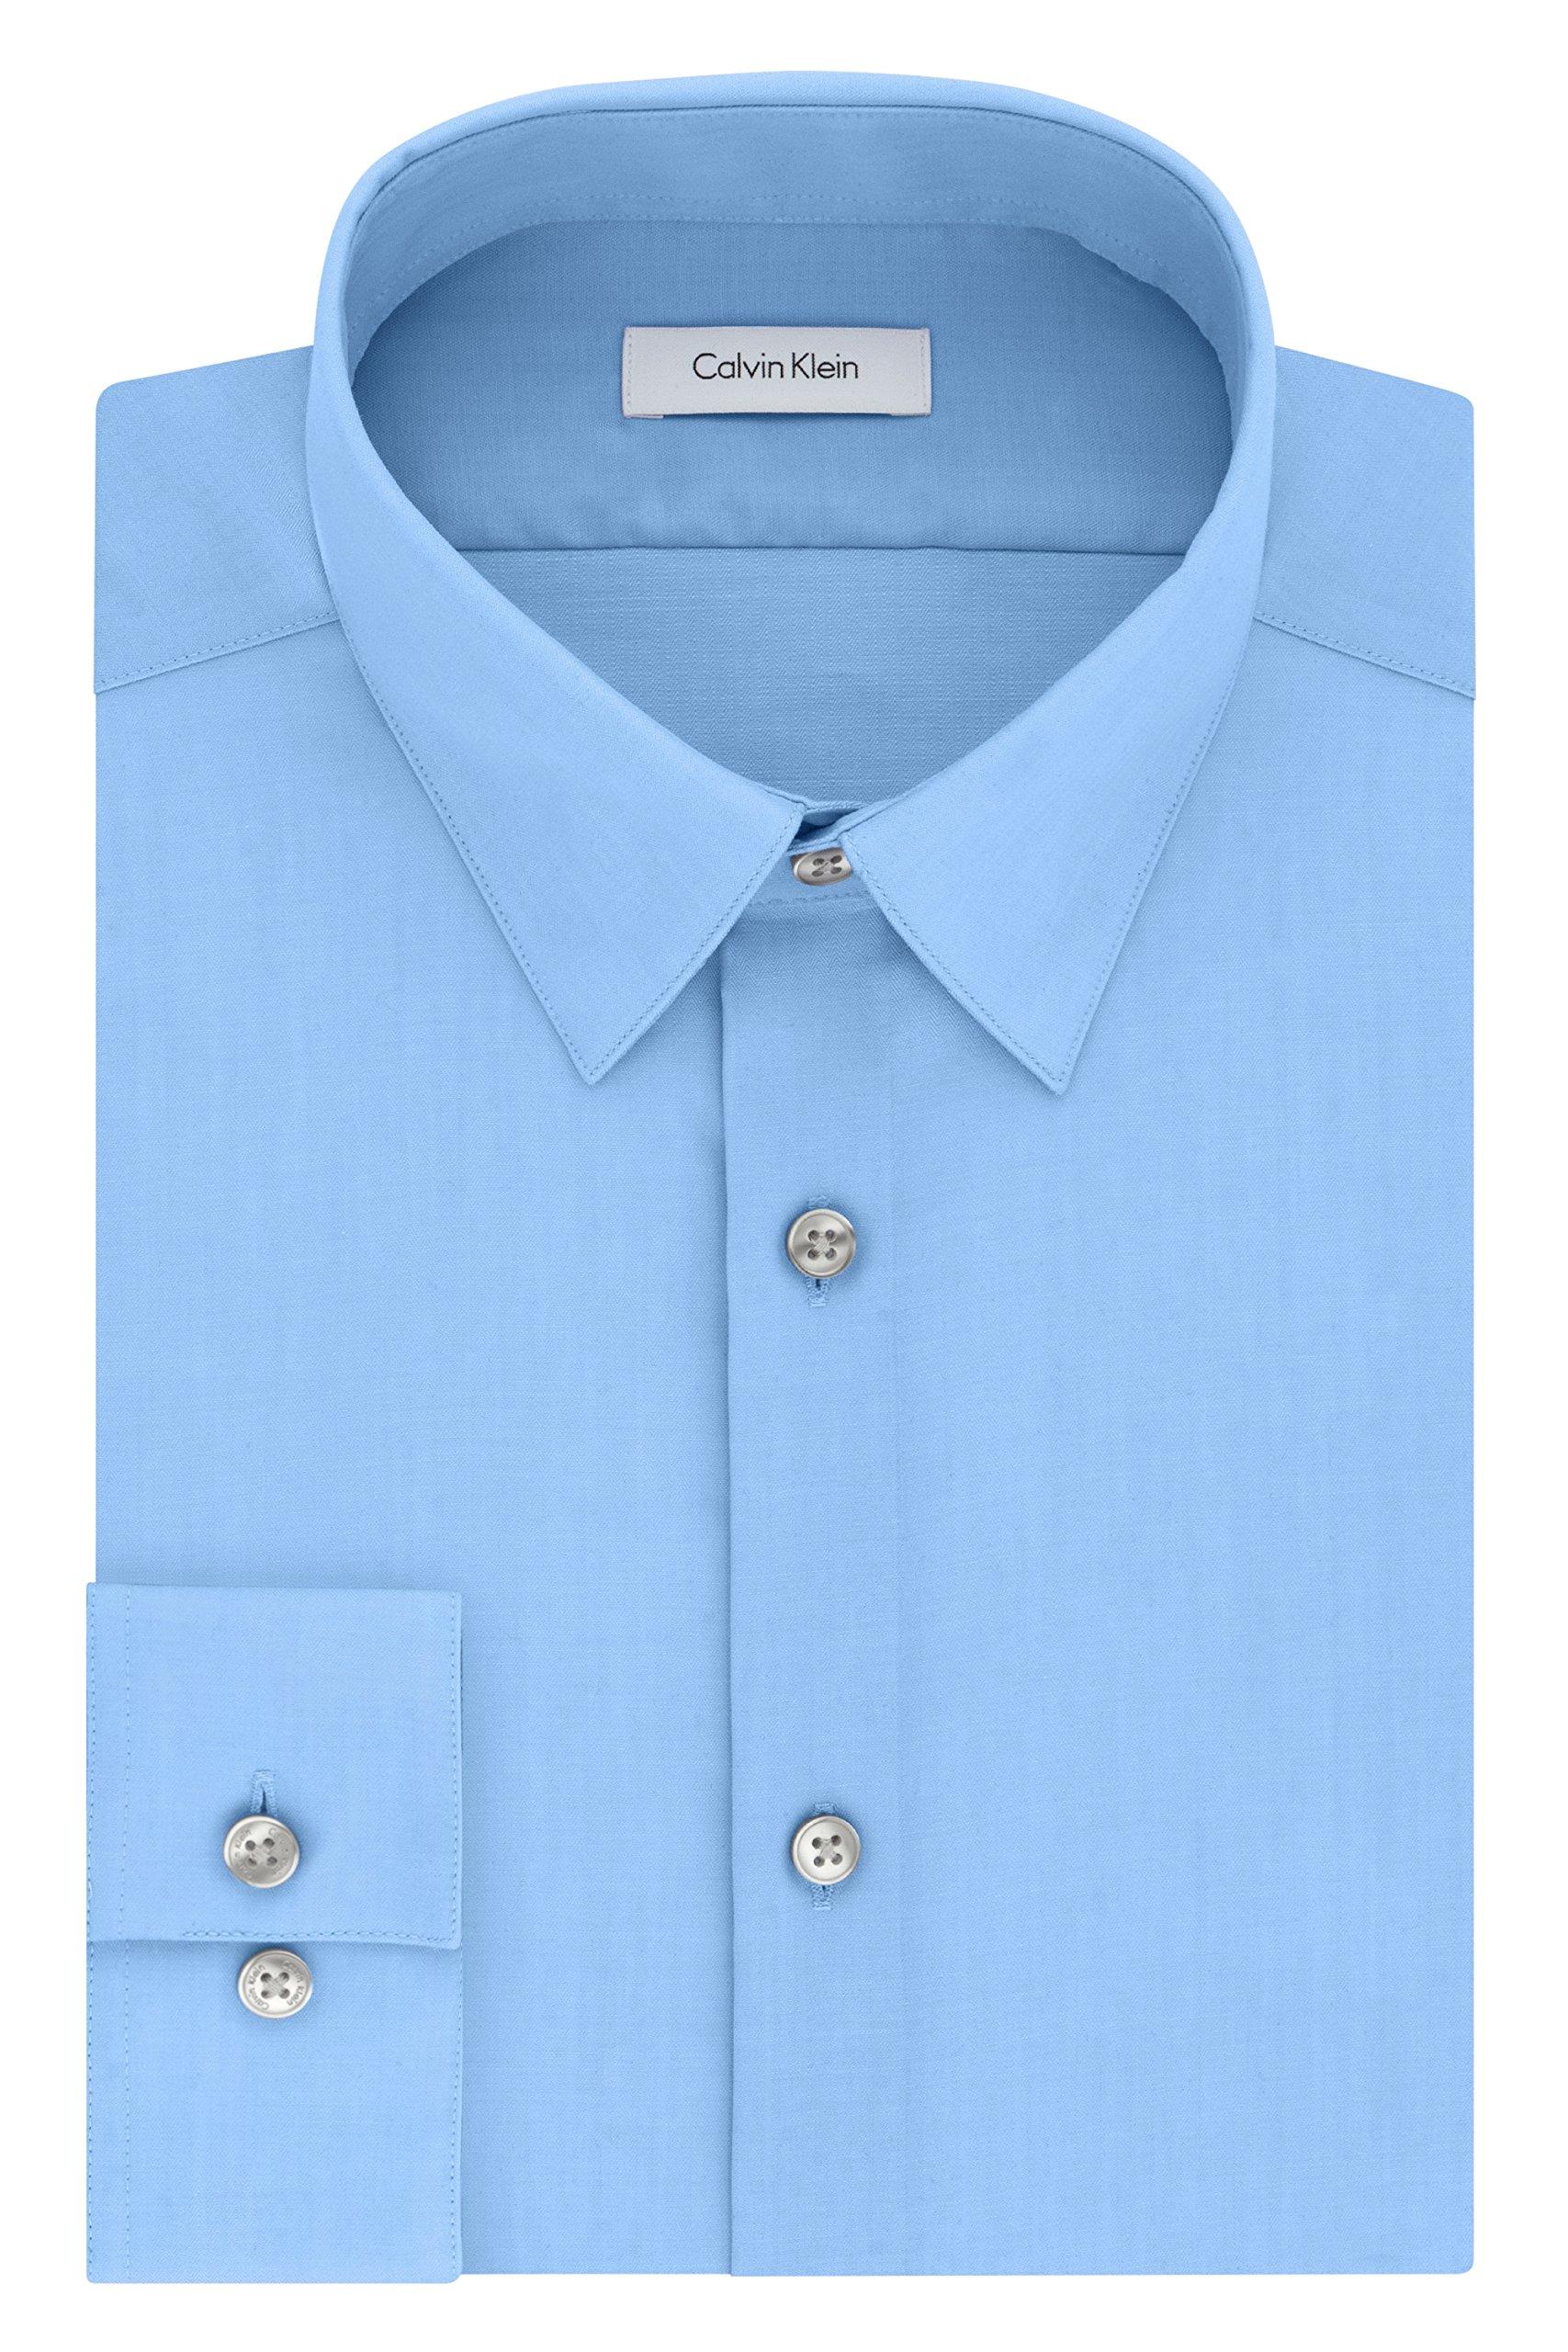 Calvin Klein Men's Slim Fit Non-Iron Herringbone Point Collar Dress Shirt, Mist, 15.5'' Neck 32''-33'' Sleeve